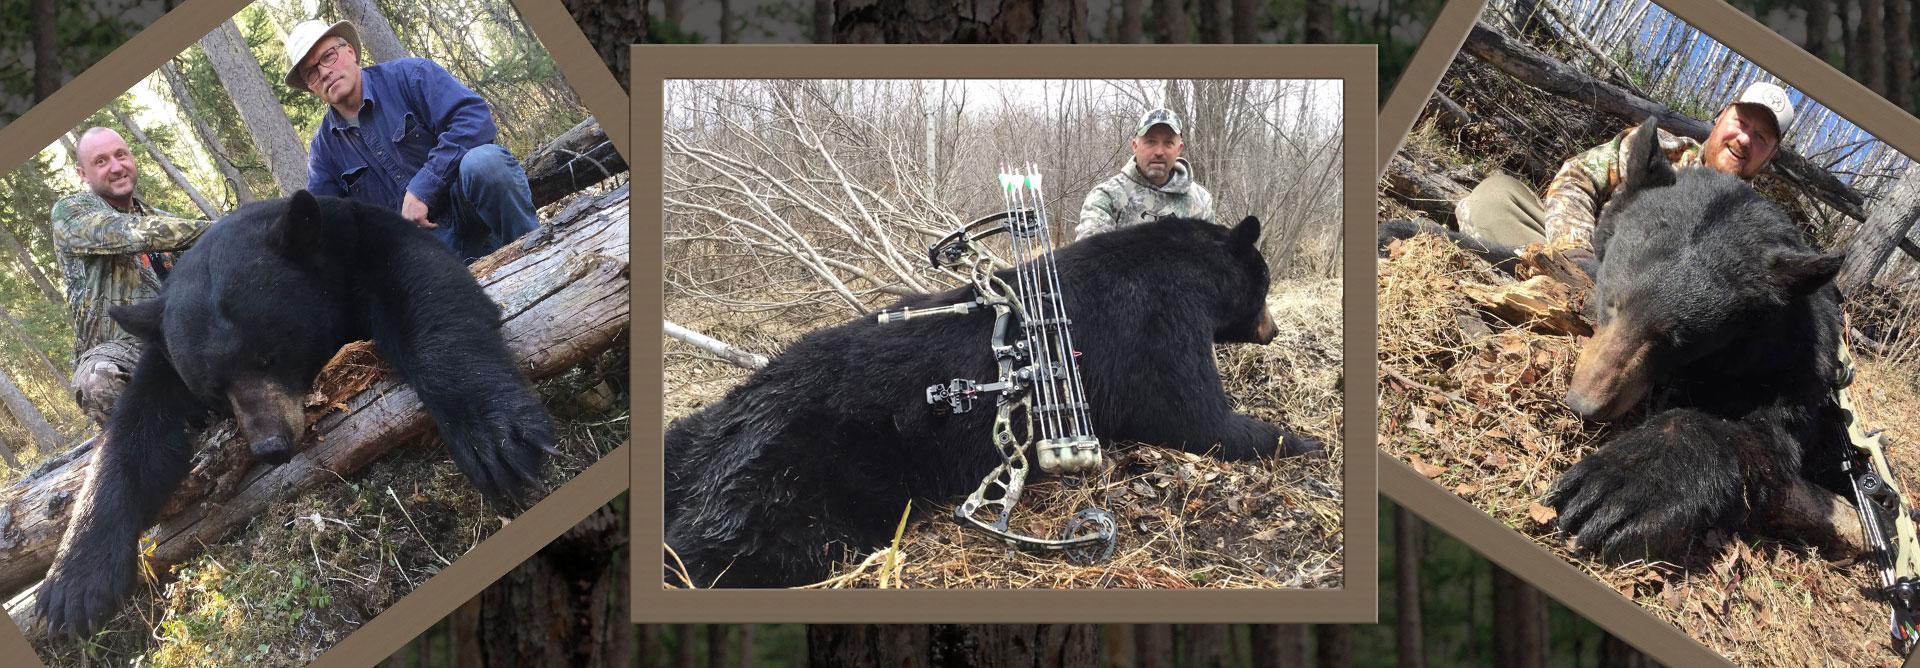 sk-black-bear-hunting